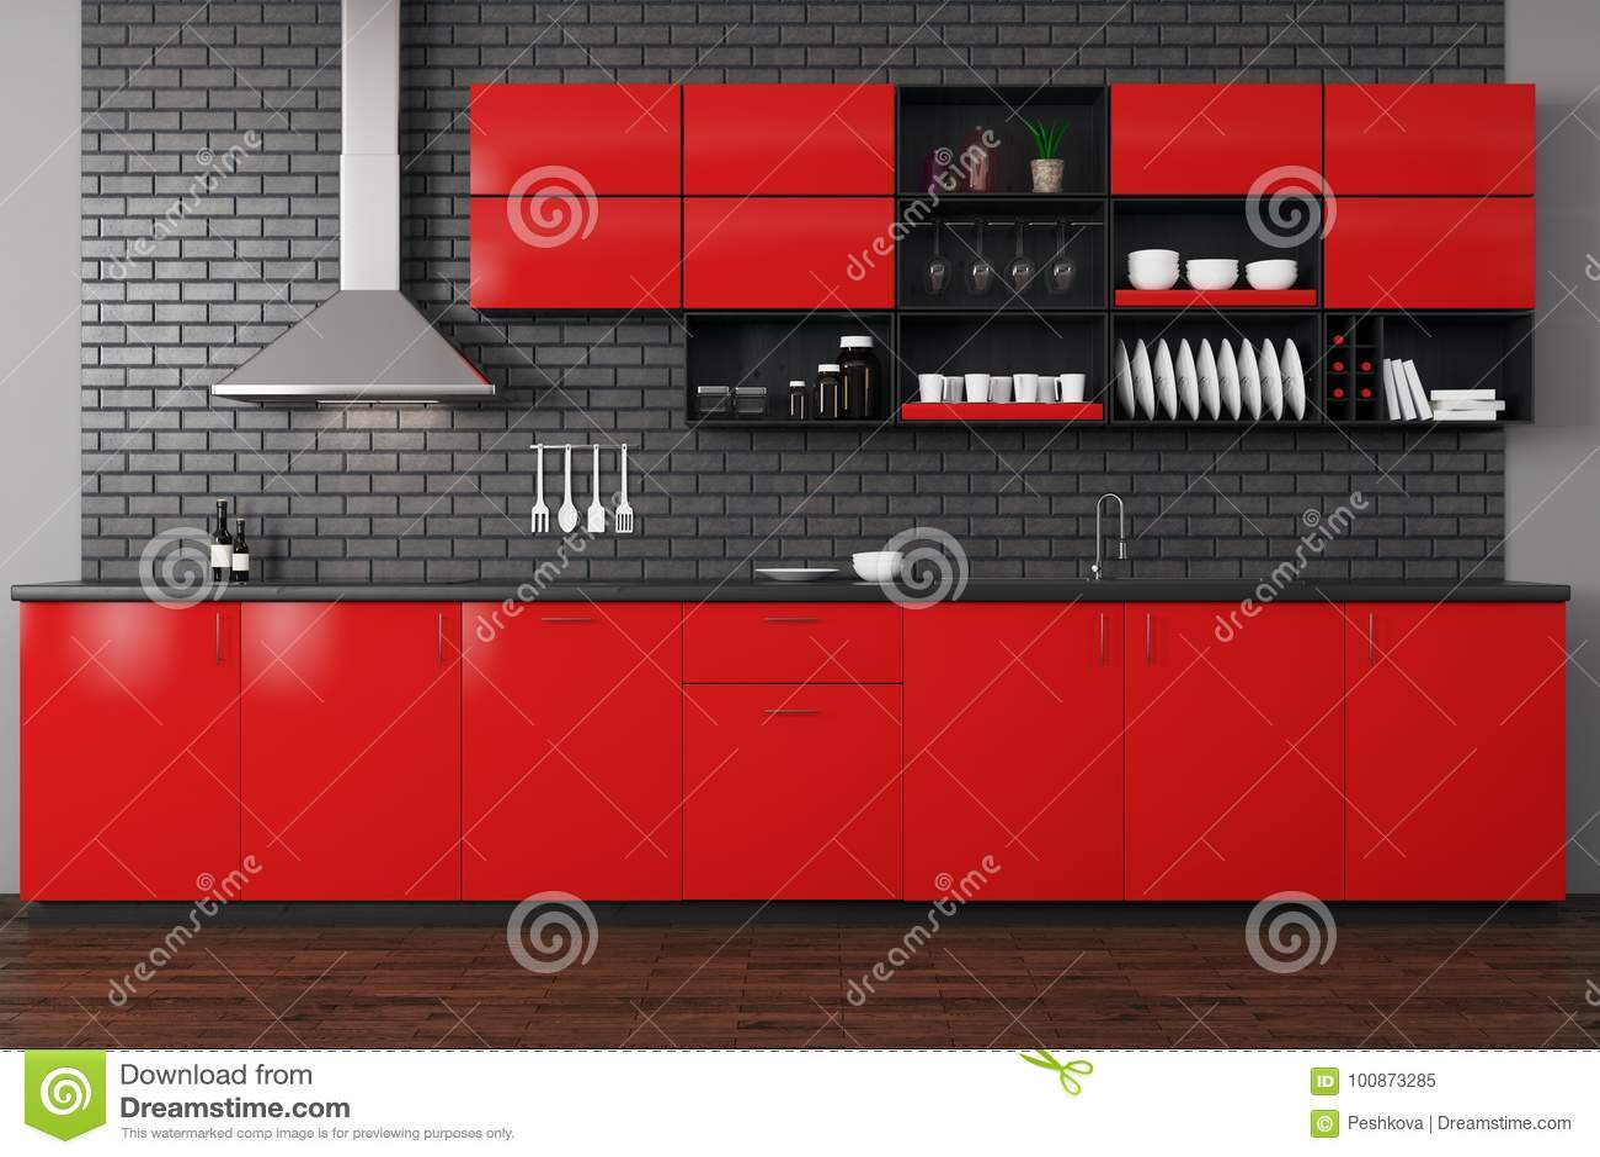 Modern red kitchen stock illustration. Illustration of brick